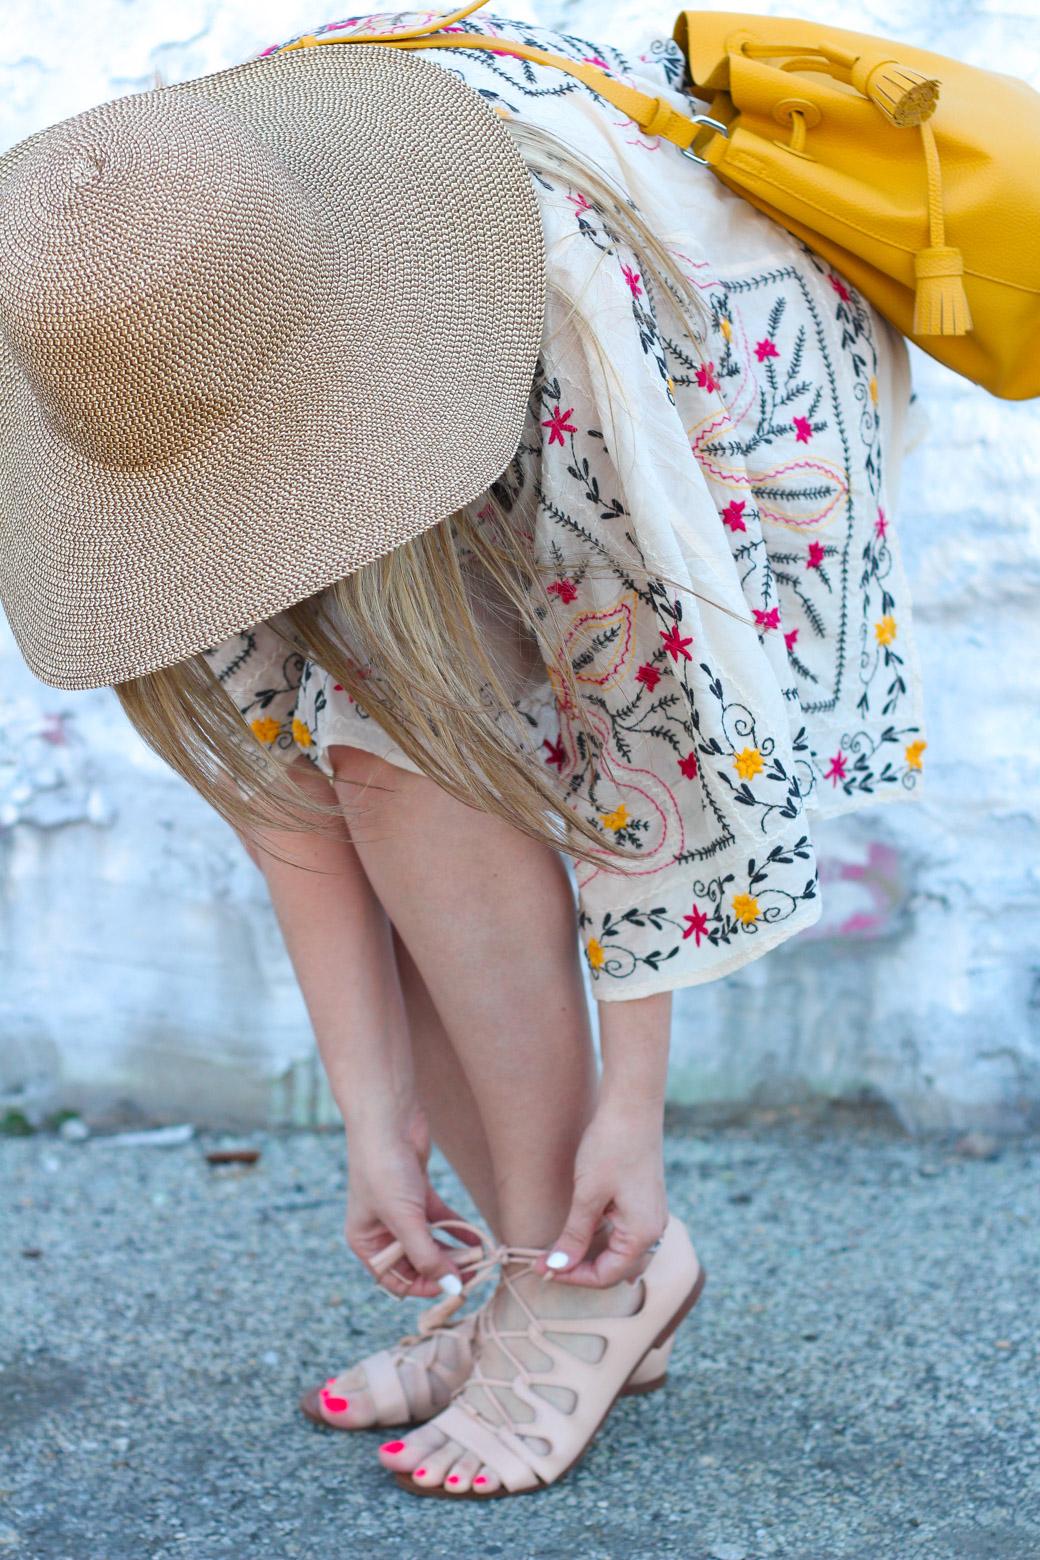 free-people-dress-chicago-fashion-blogger-26